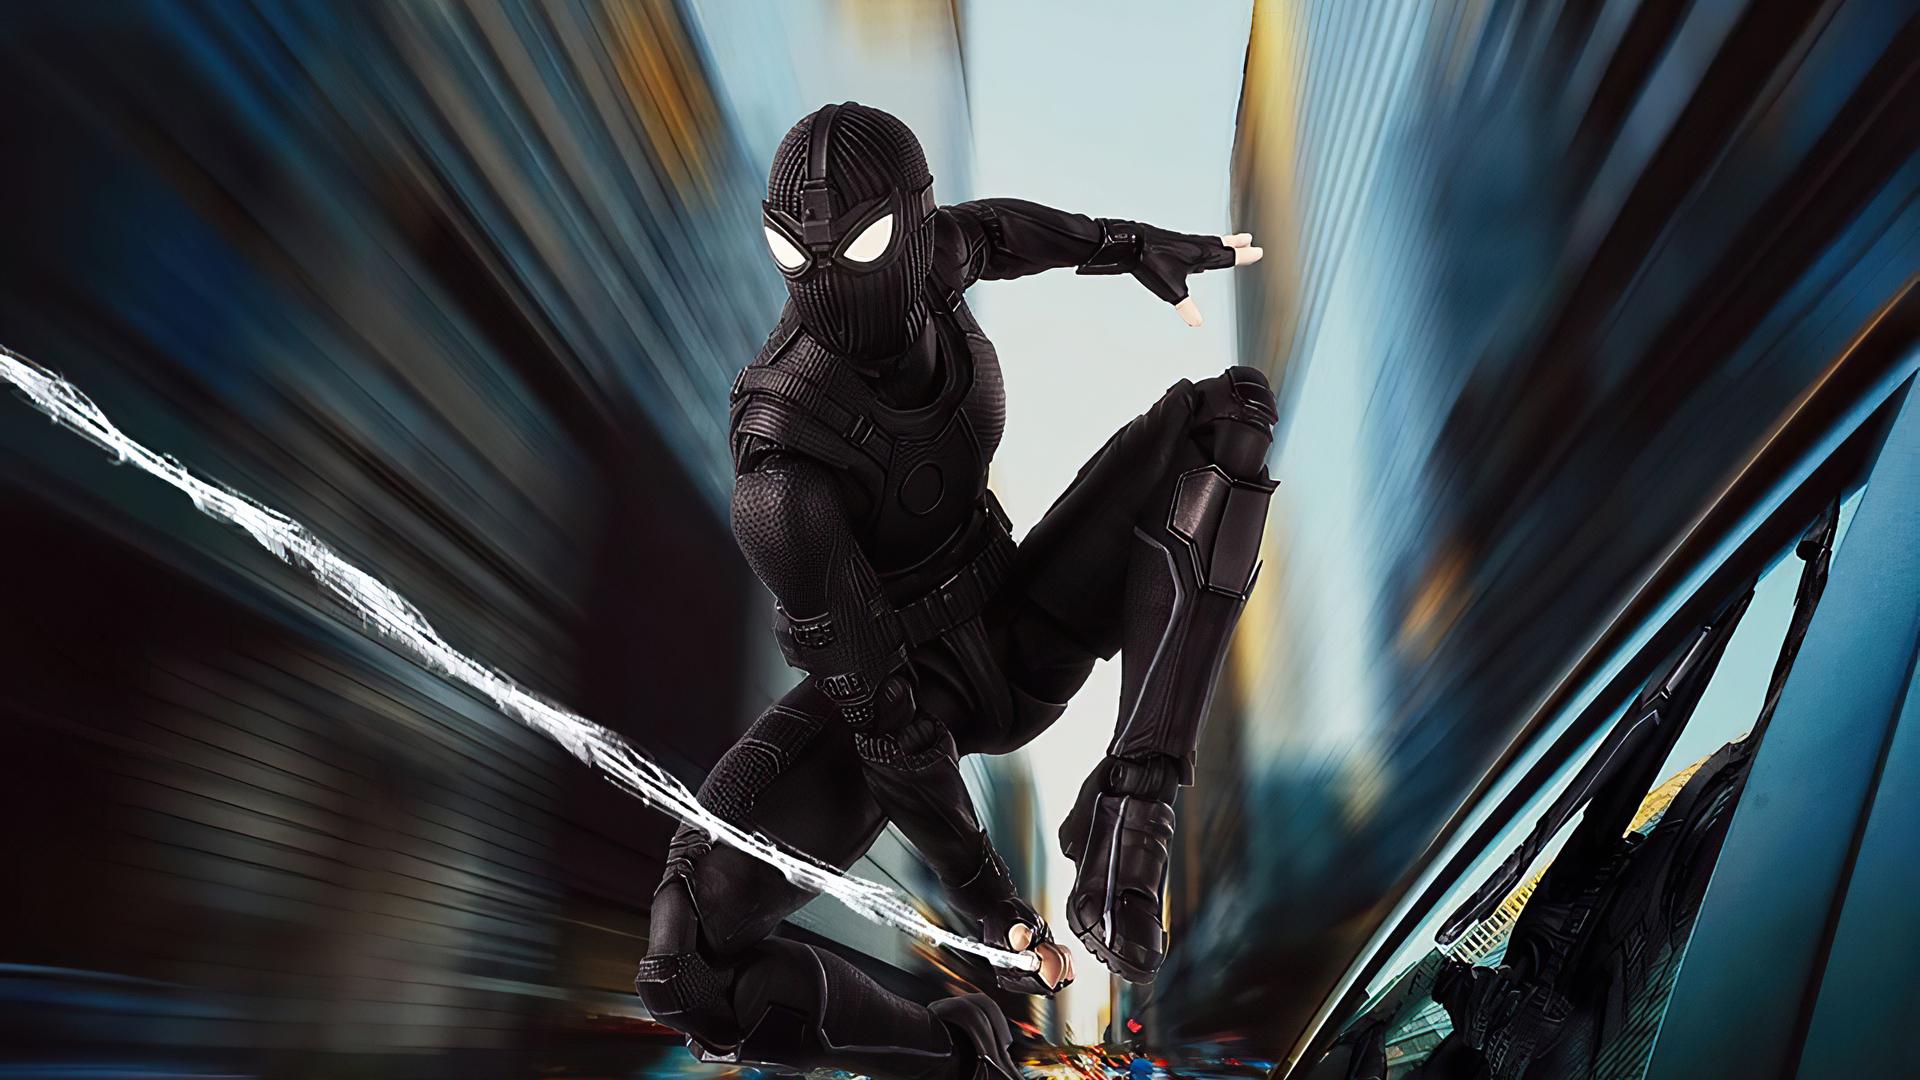 1920x1080 Spiderman Black Suit 2020 Laptop Full HD 1080P ...